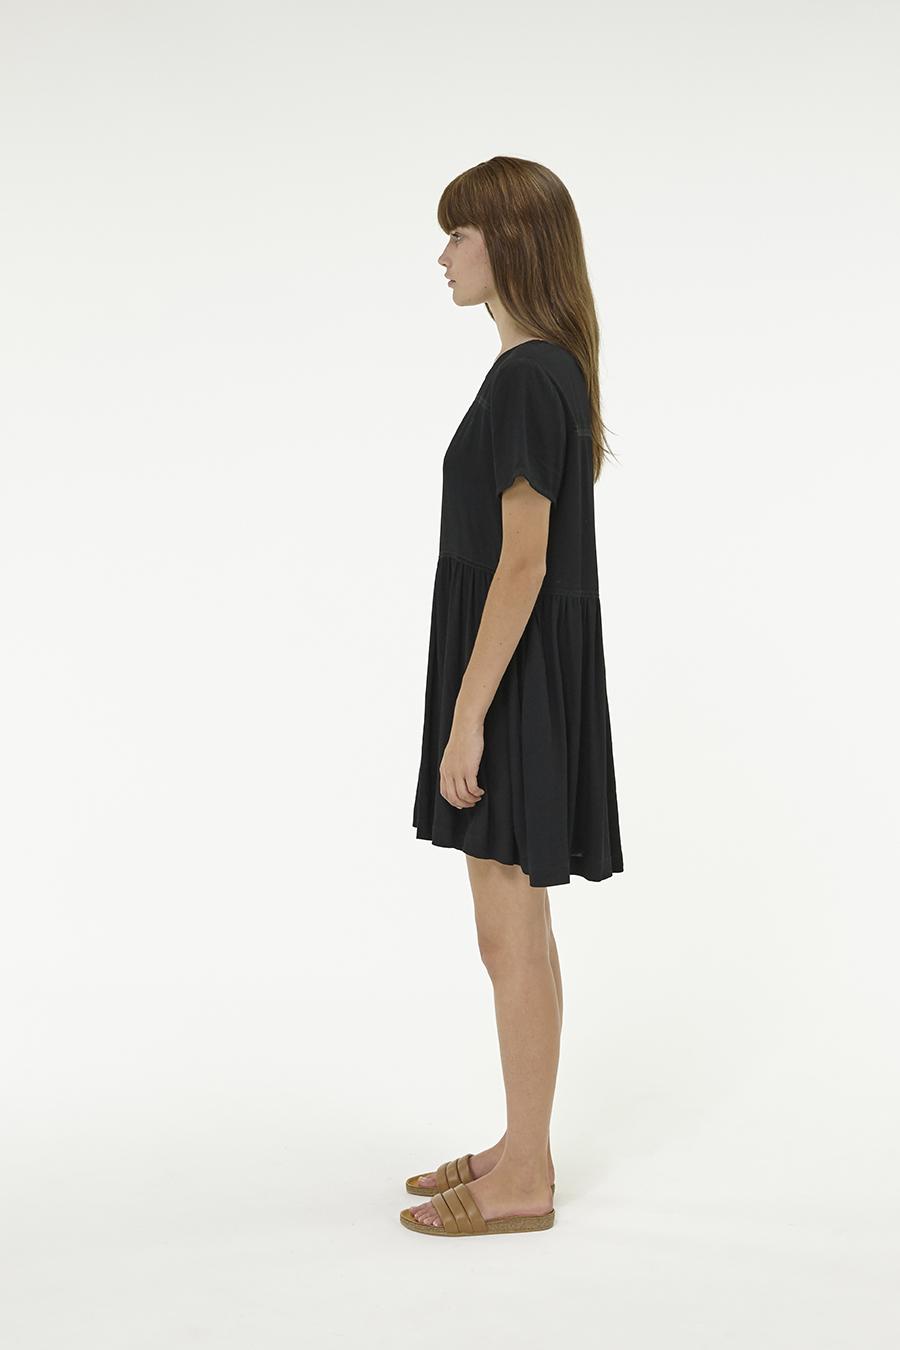 Huffer_Q3-16_W-Park-Dress_Black-02